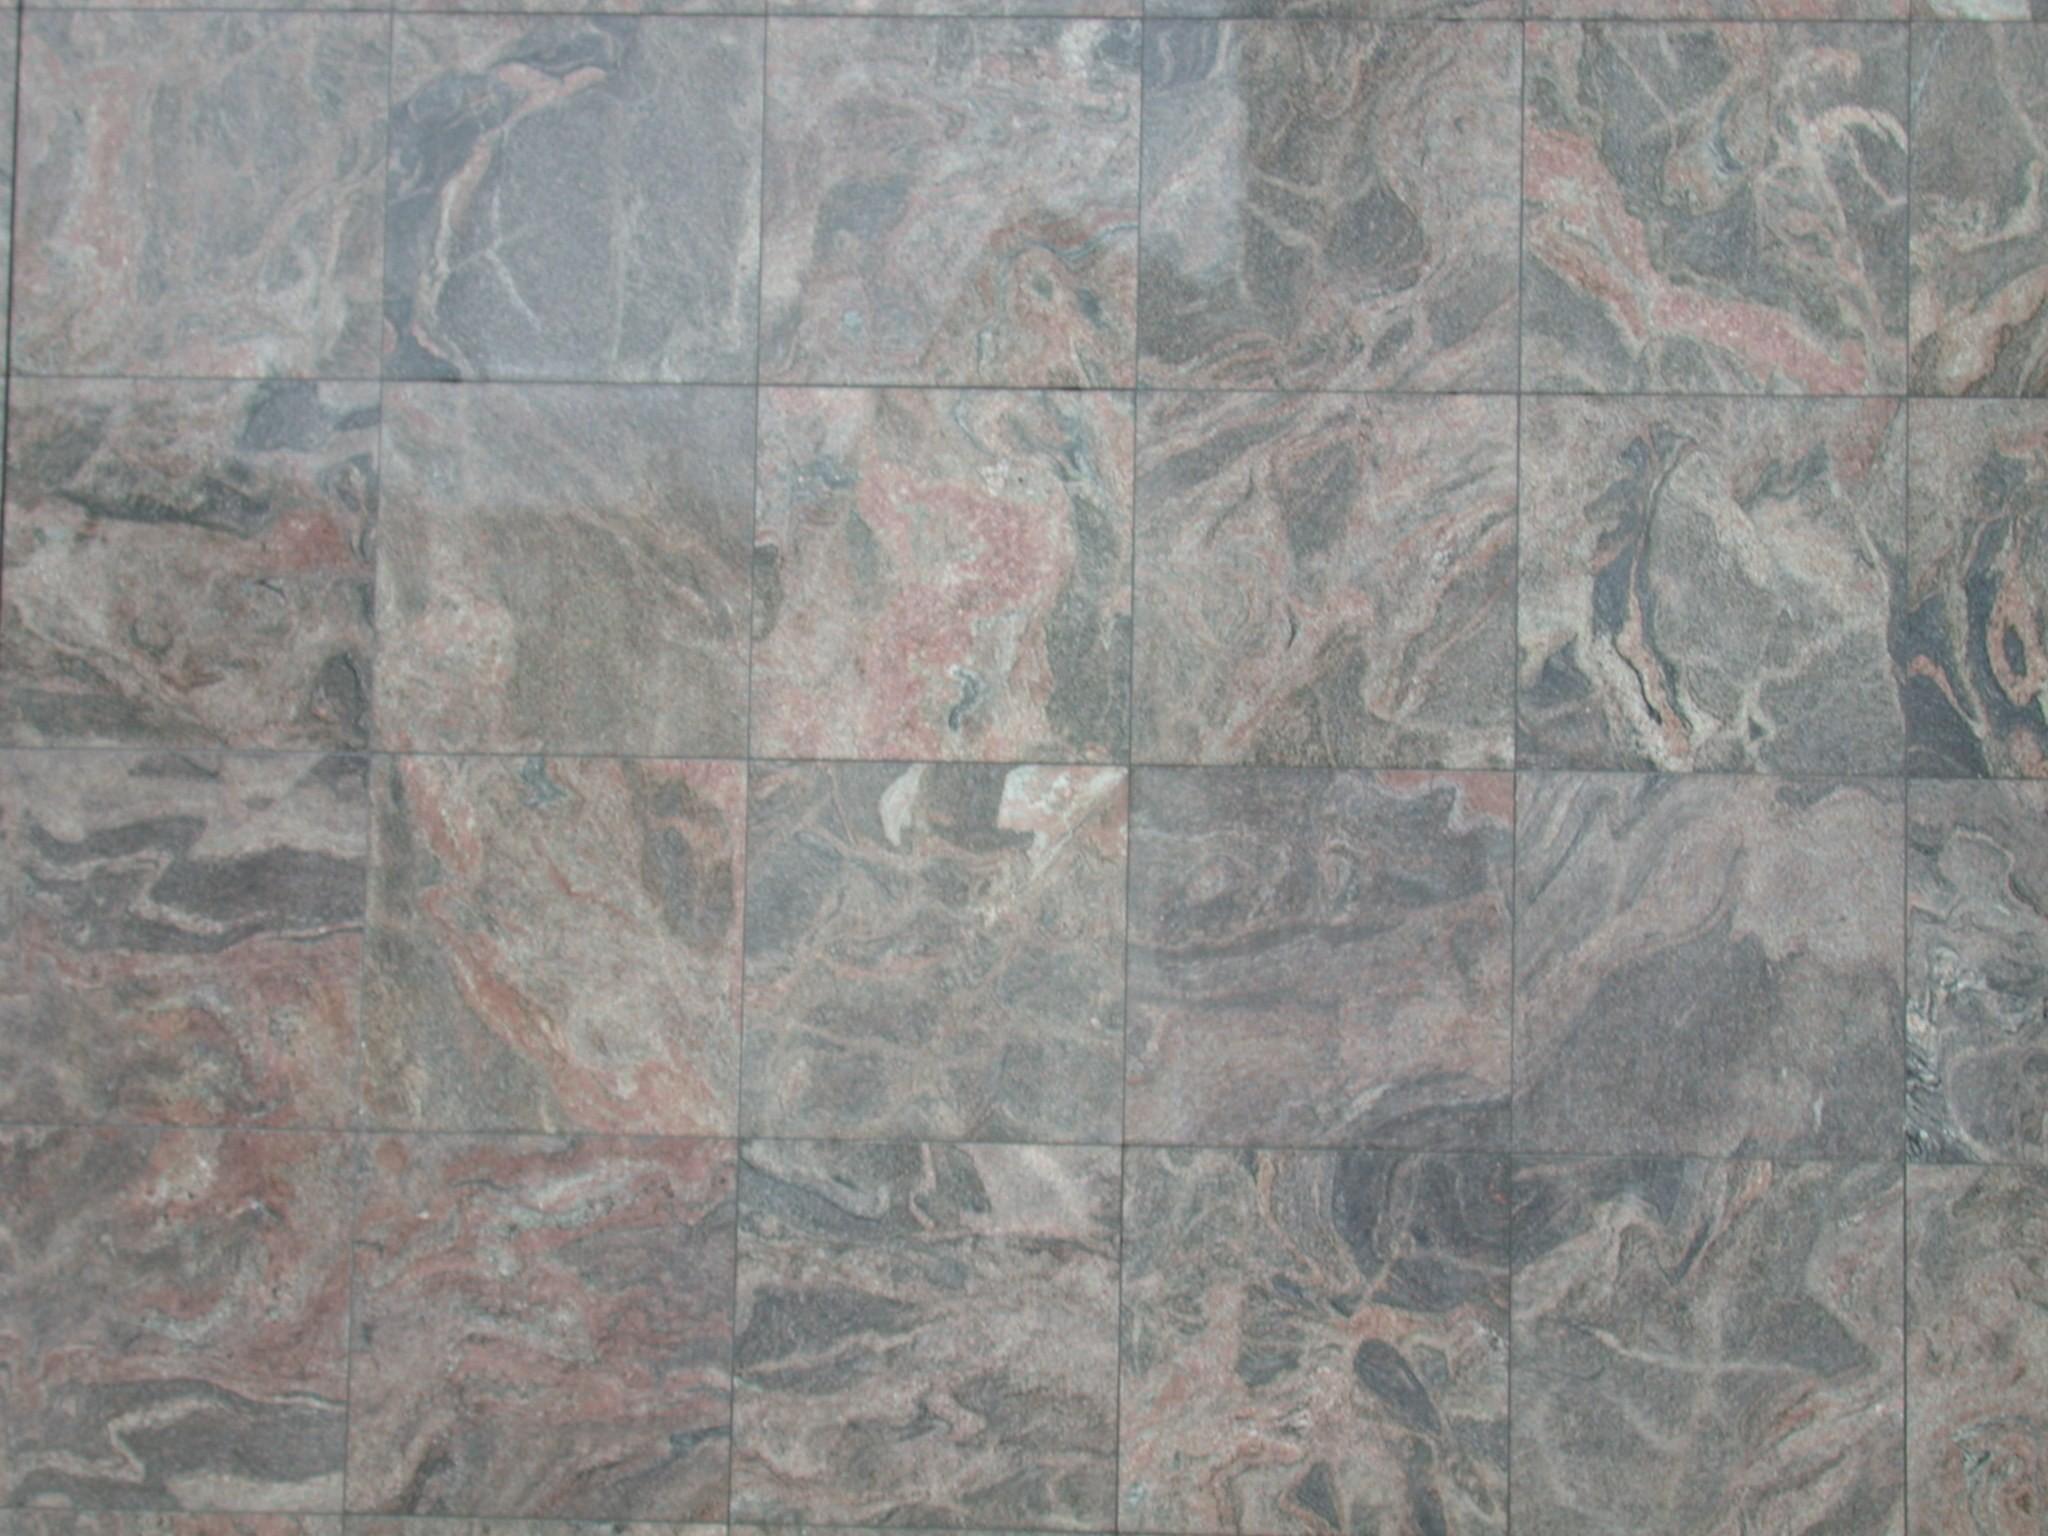 1080x1920 Stone Wall Texture IPhone 6 Plus HD Wallpaper